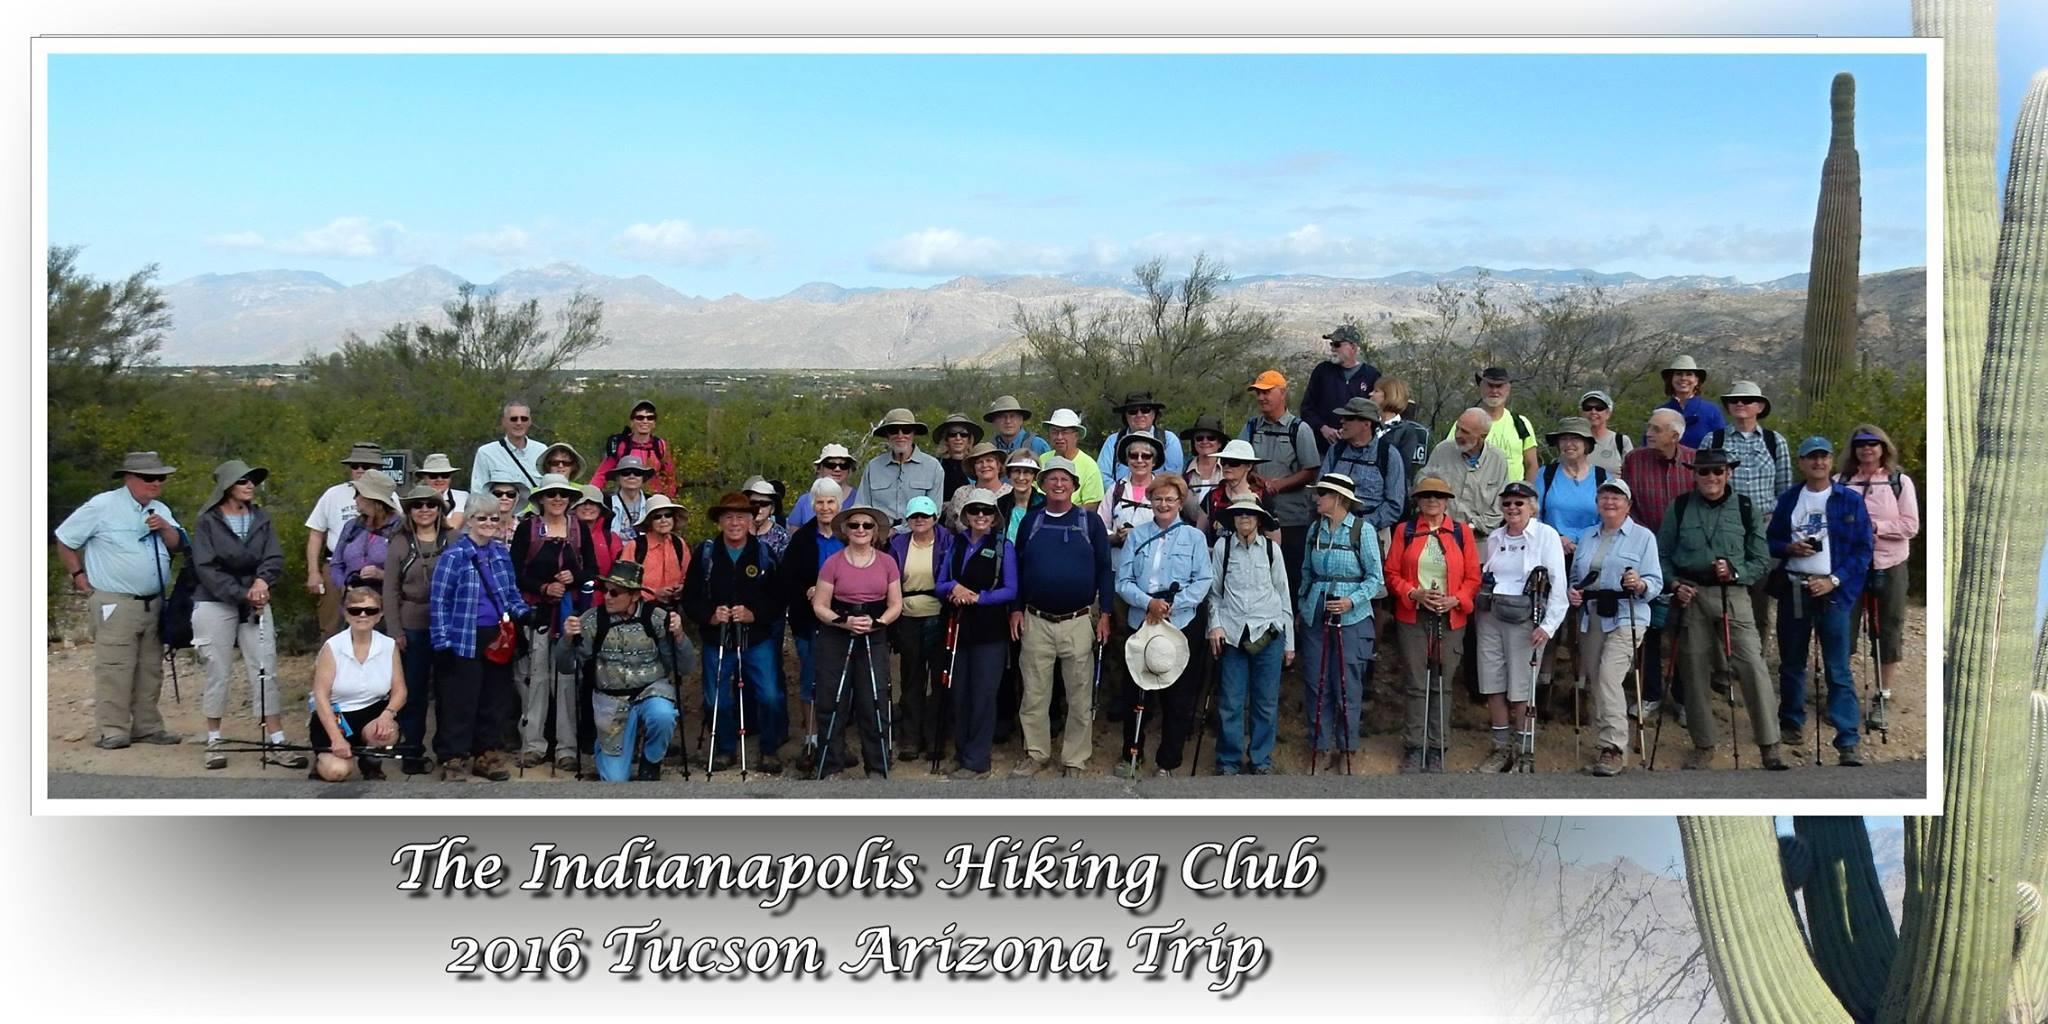 indianapolis hiking club